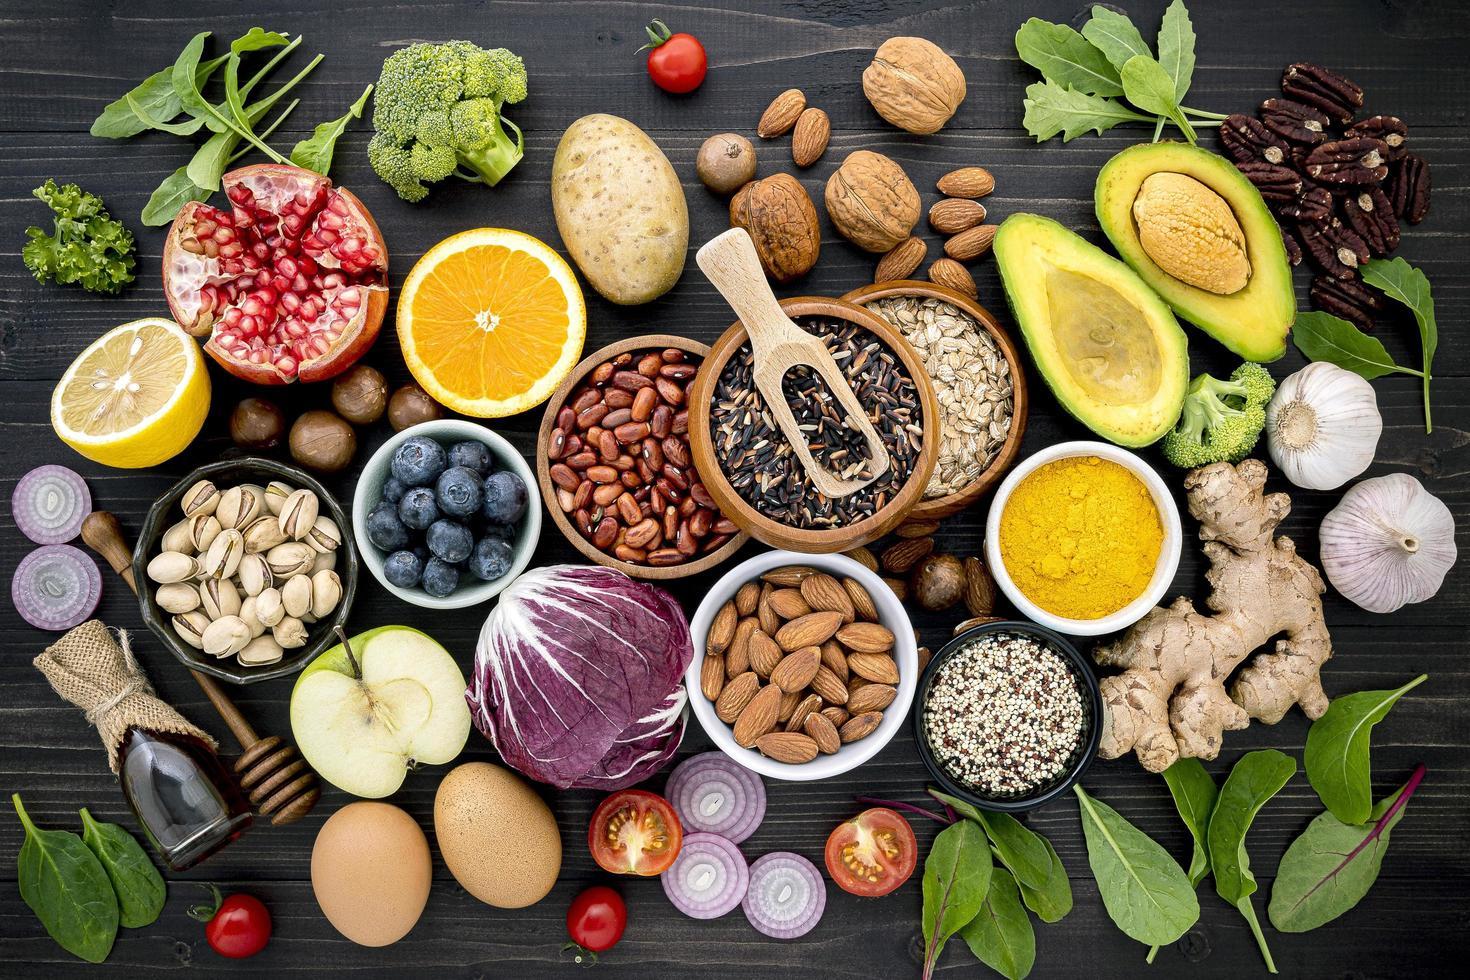 Healthy fresh foods on a dark wooden background photo